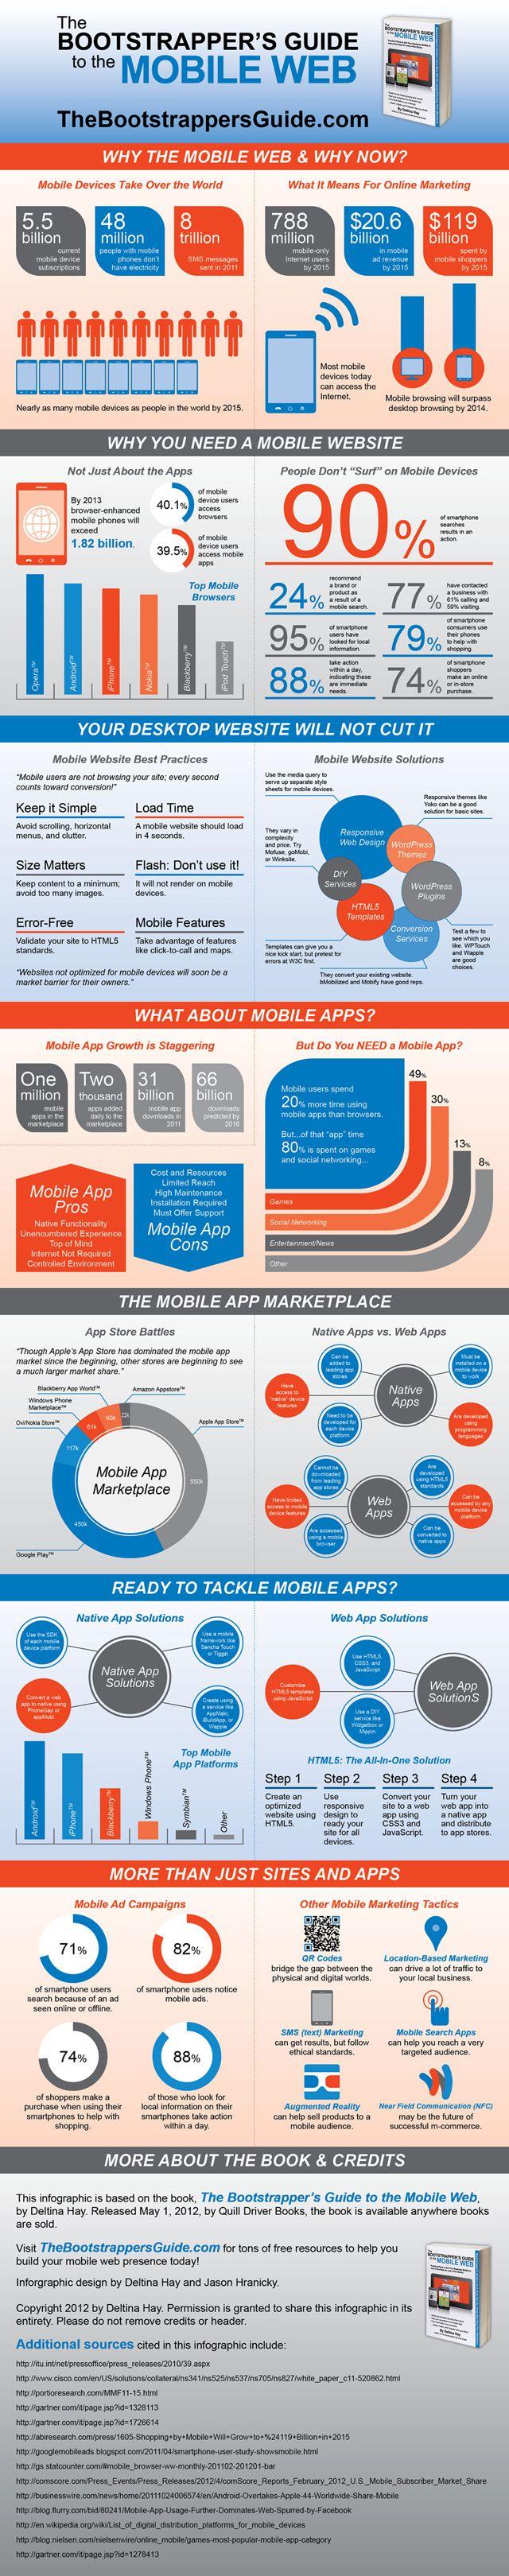 Mobil İnternet İnfografik: Bootstrapp Guide, Ultimate Mobiles, Guide To, Mobiles Web, Social Media, Web Infographic, Mobiles Phones, Mobiles Marketing, Mobile Web